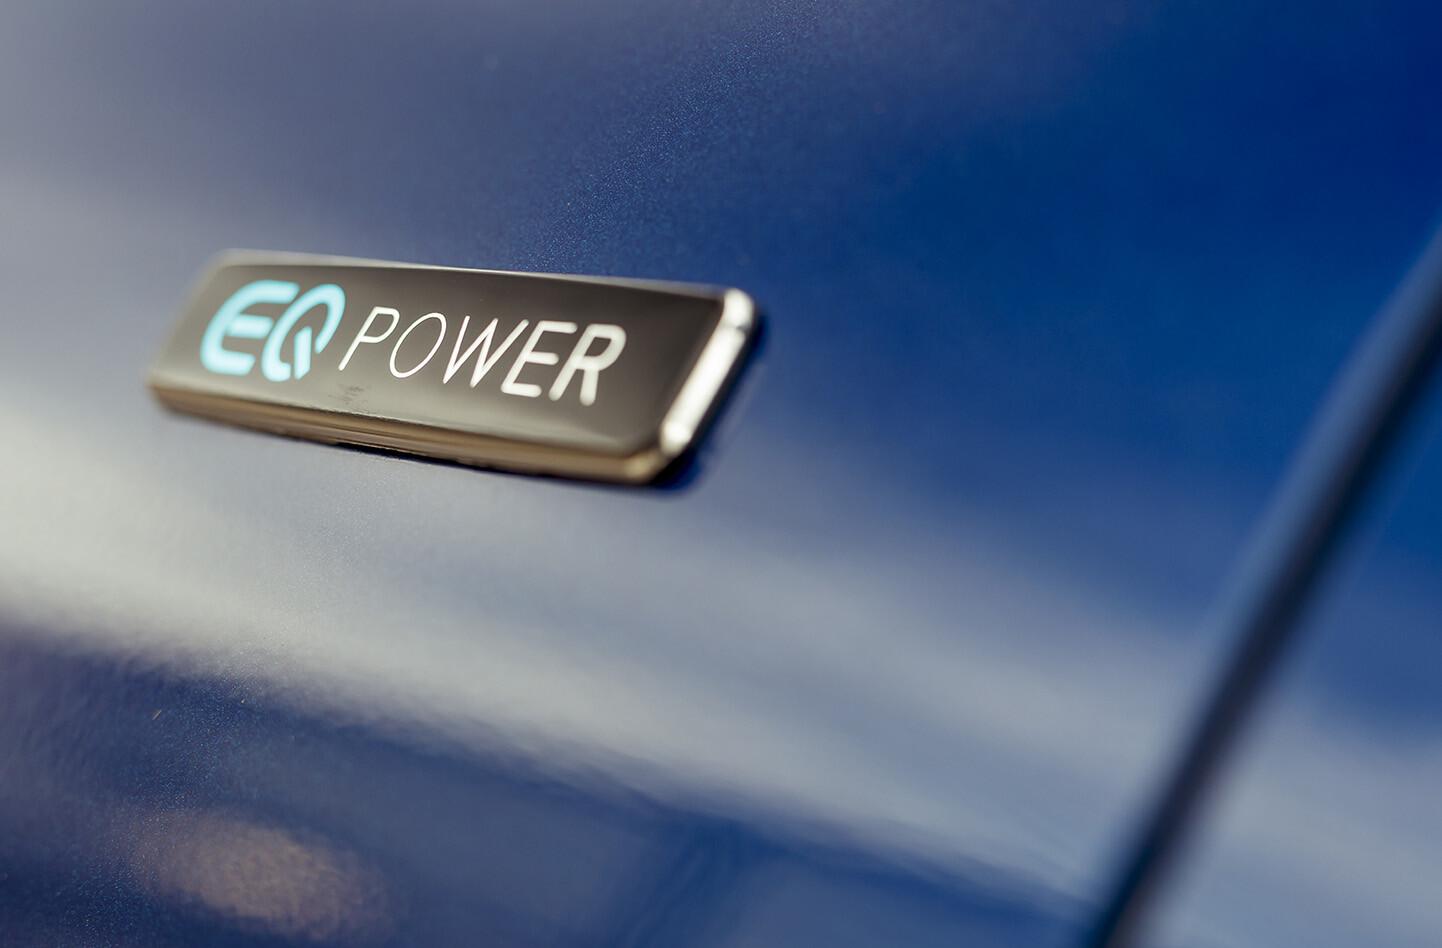 Mercedes-Benz GLC 300e EQ POWER